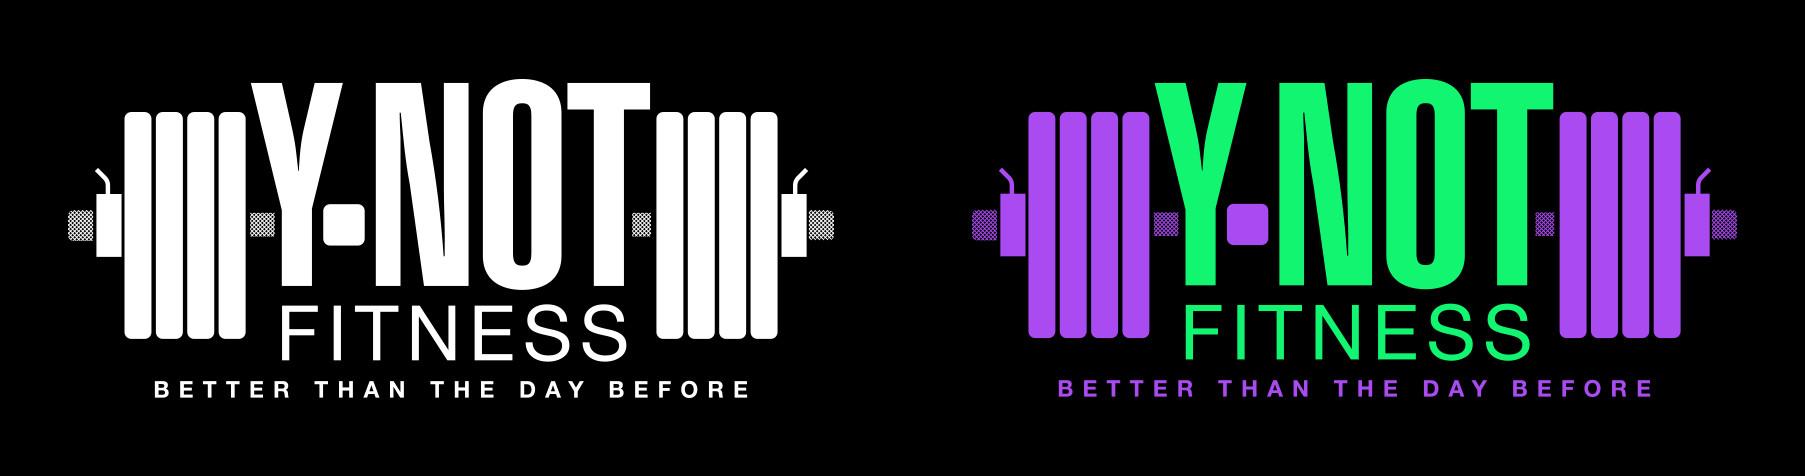 ynot_fitness.jpg